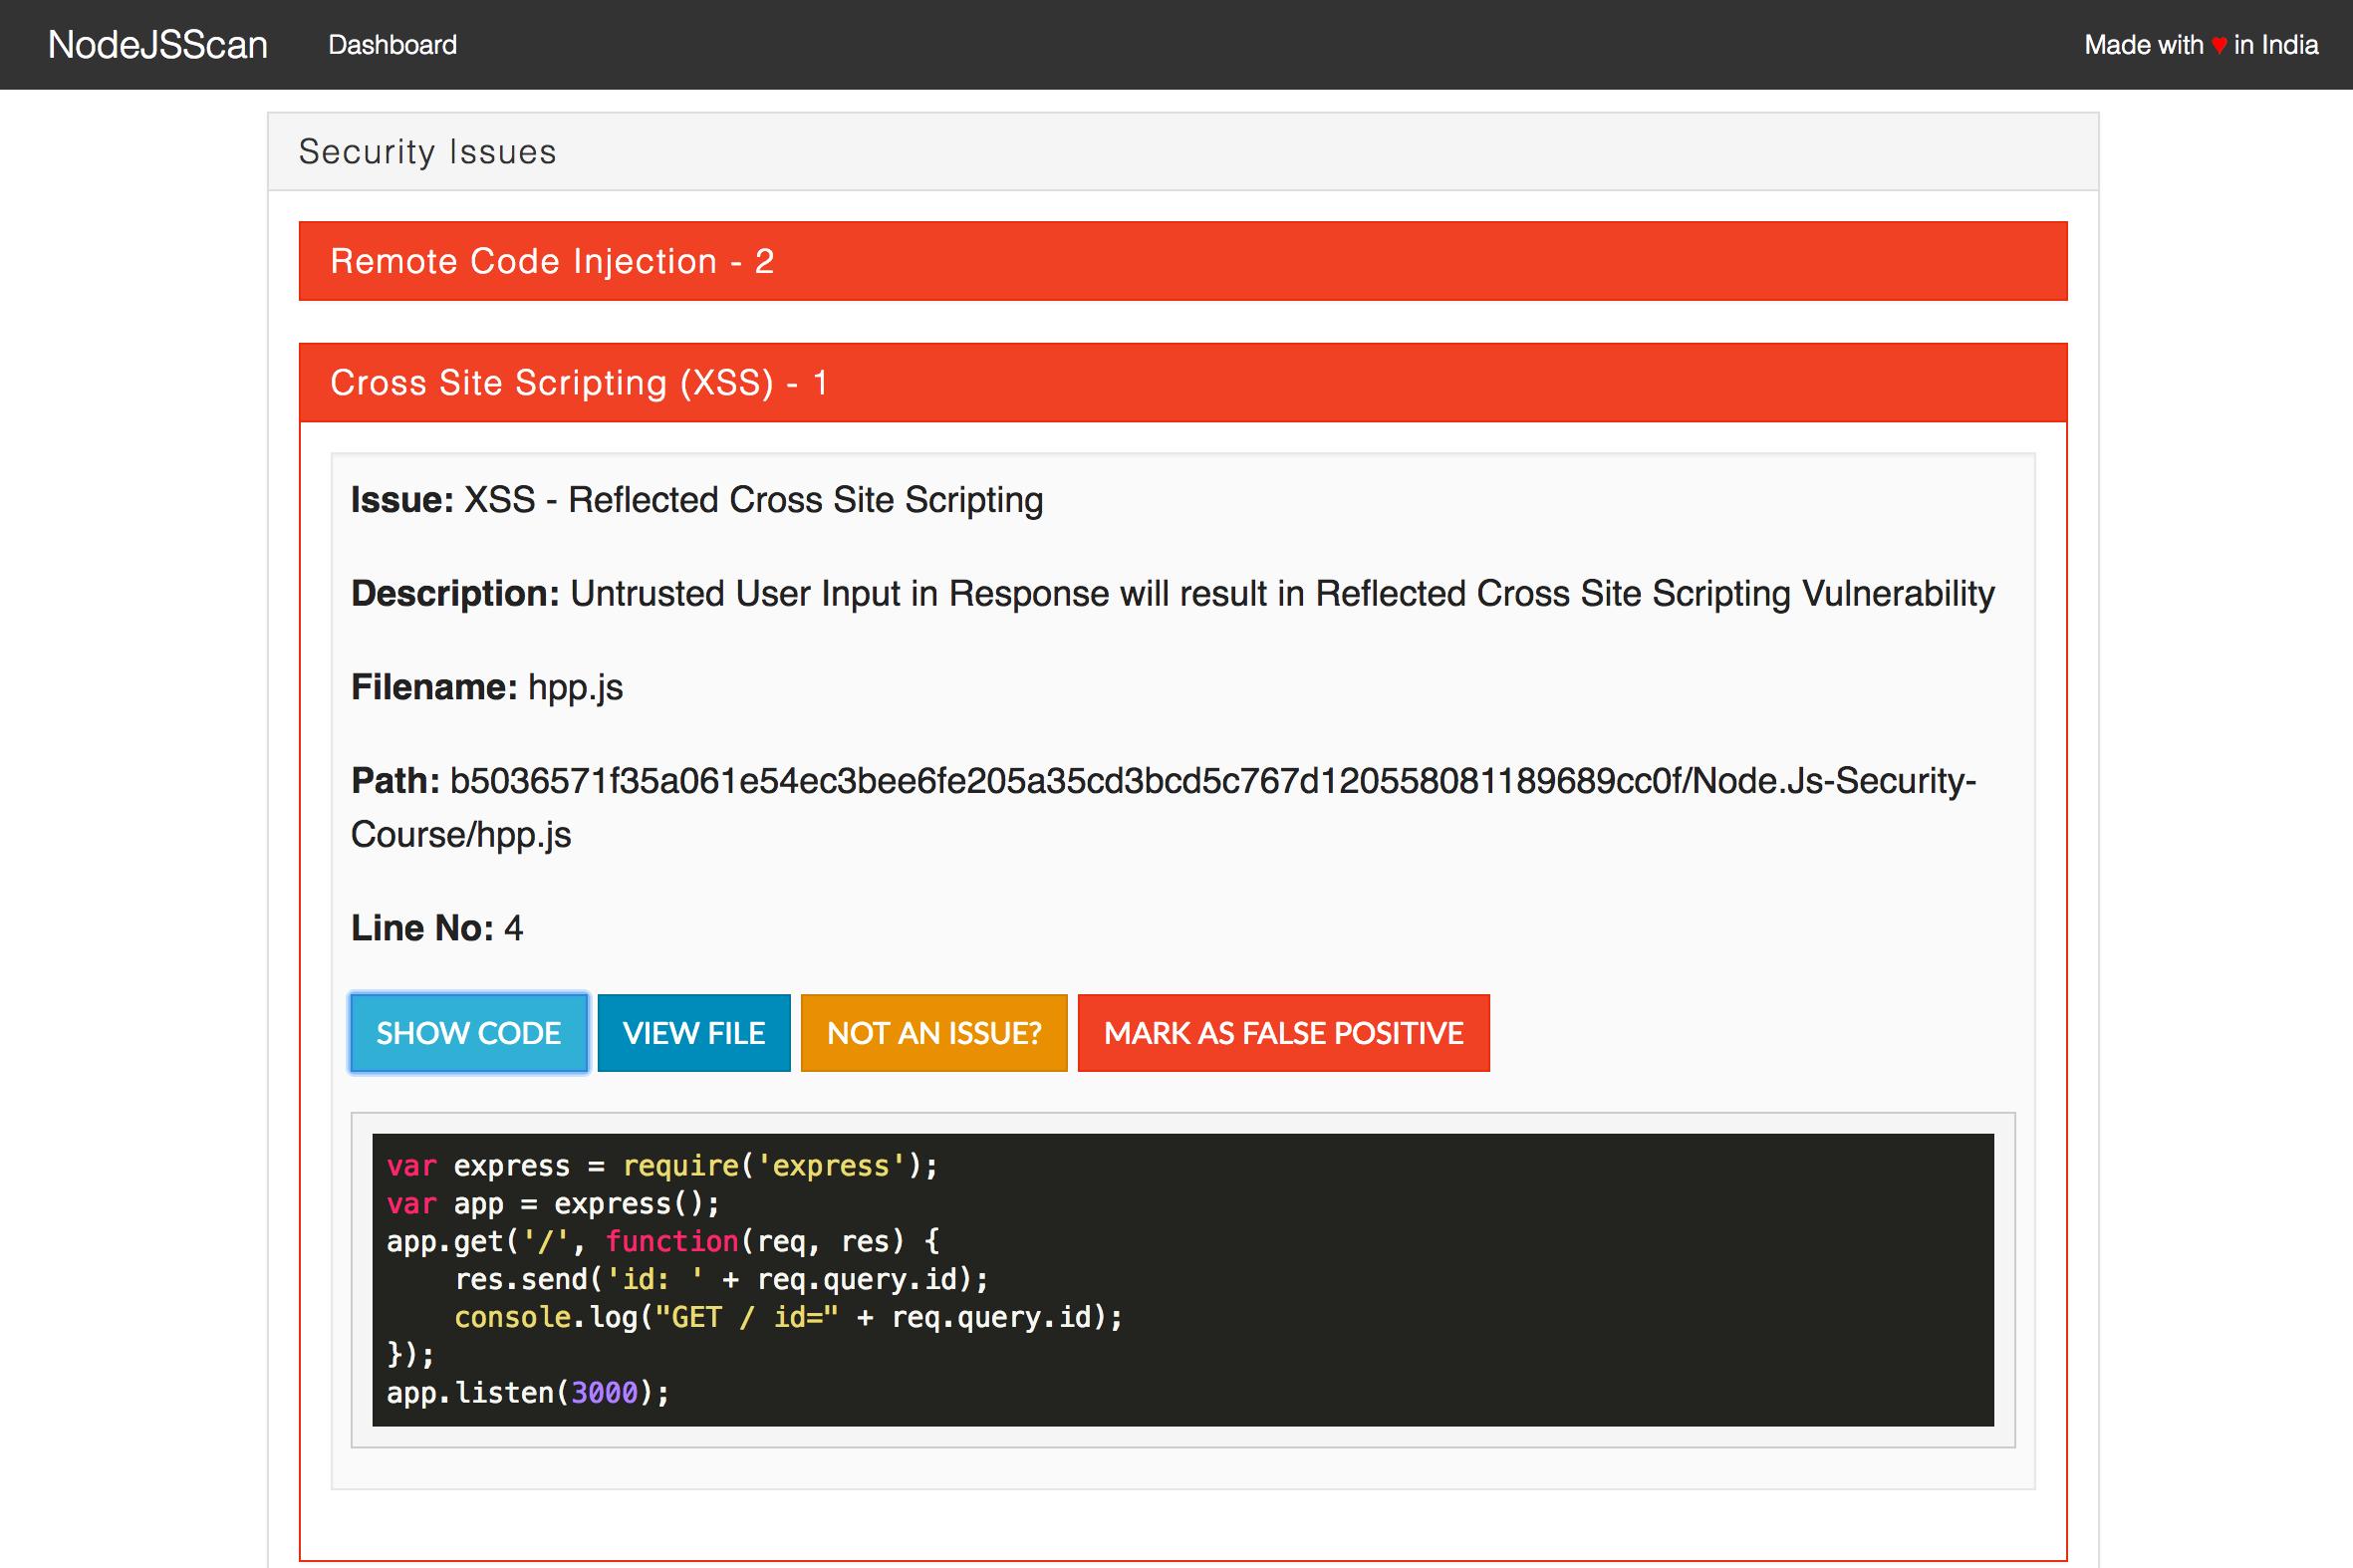 NodeJsScan Static Scan Vulnerability Details